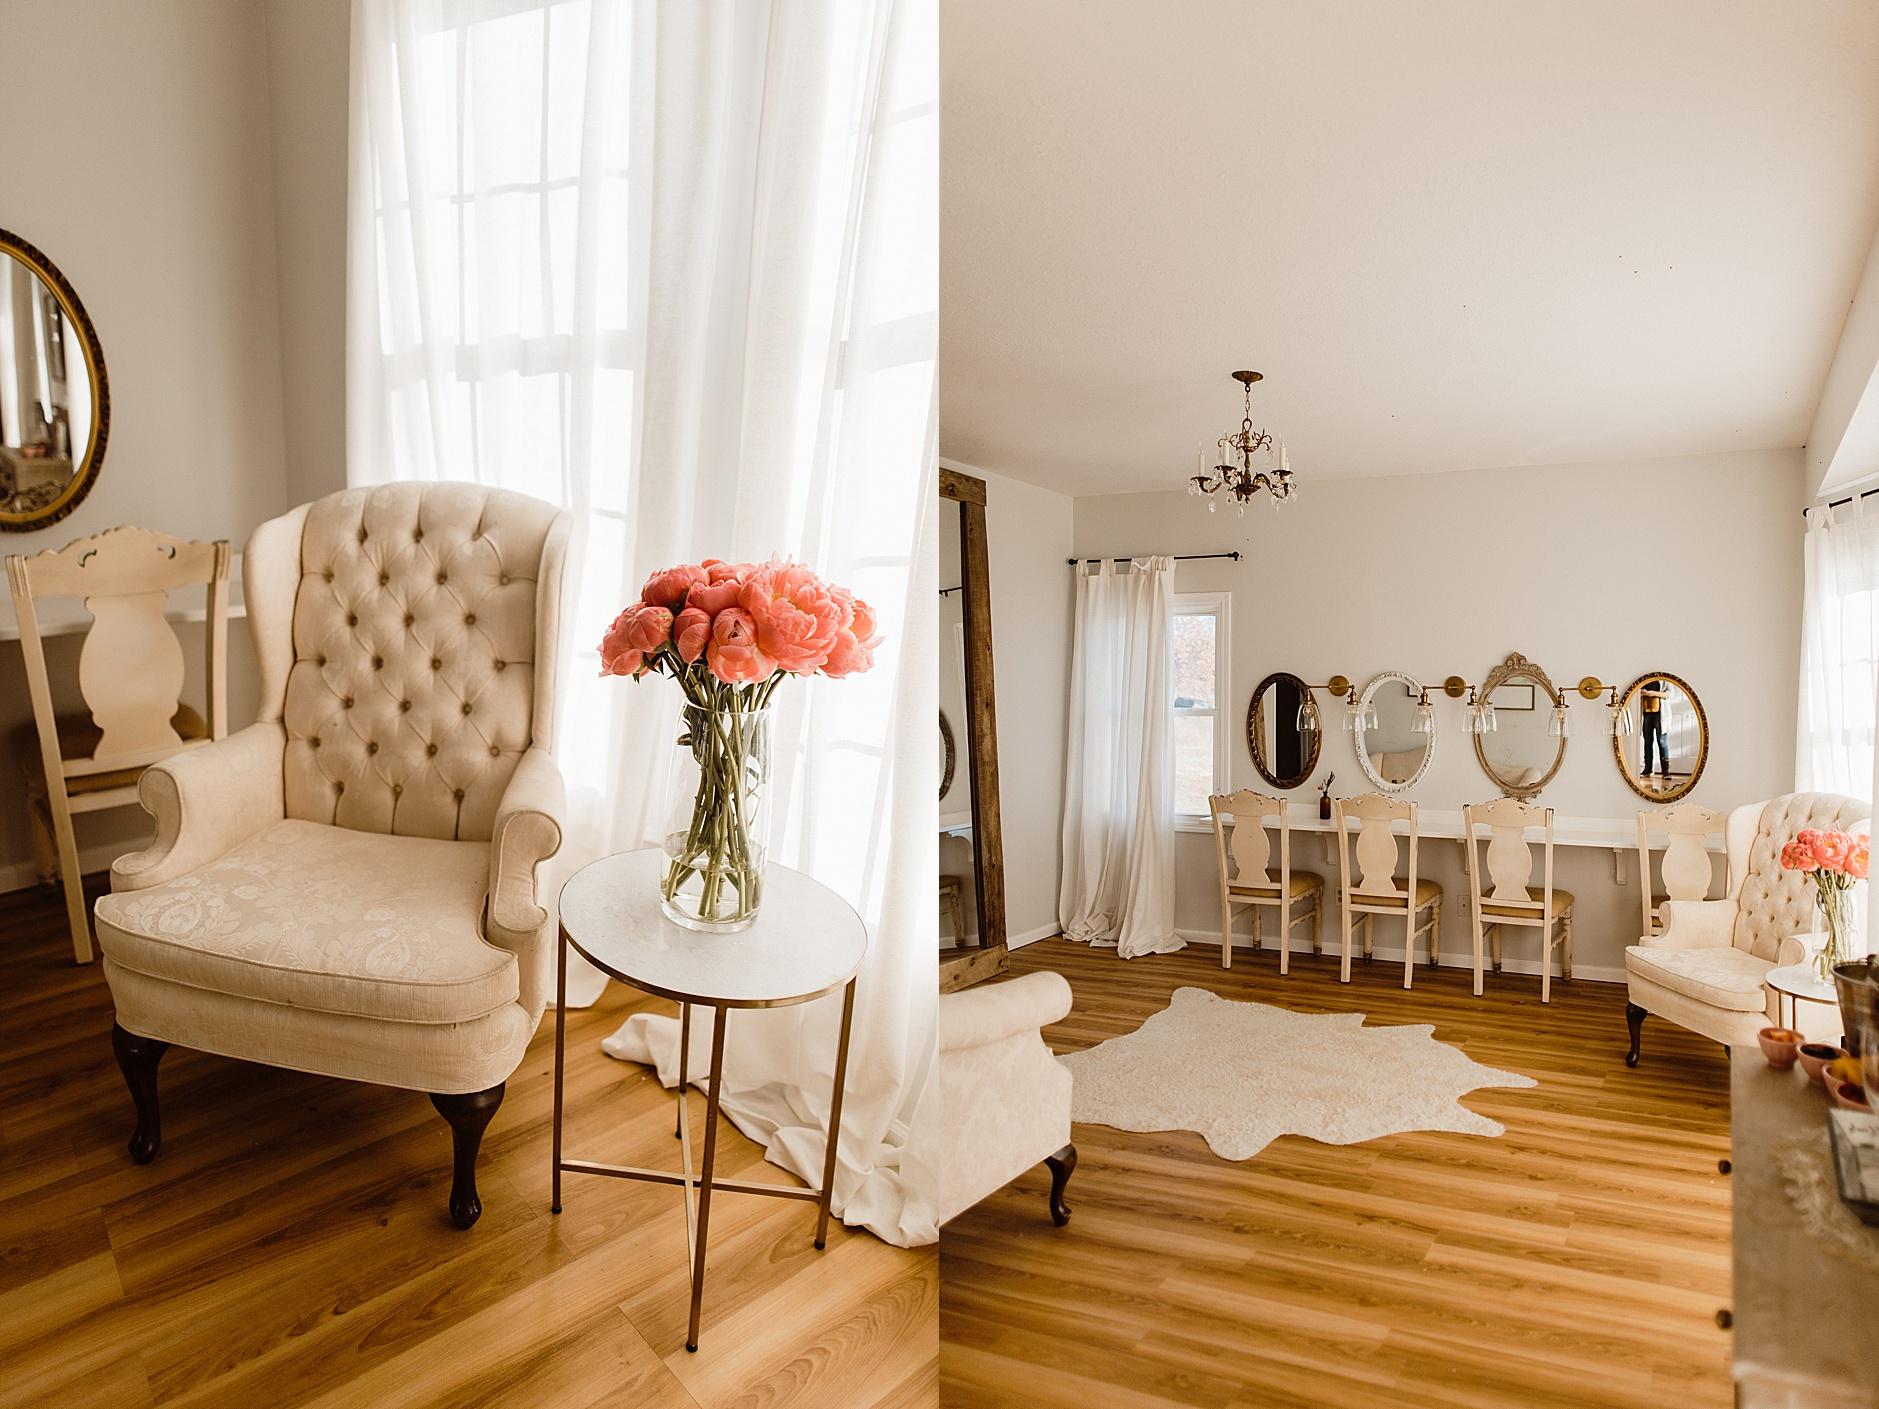 kansas city wedding venue inspiration-9550.jpg